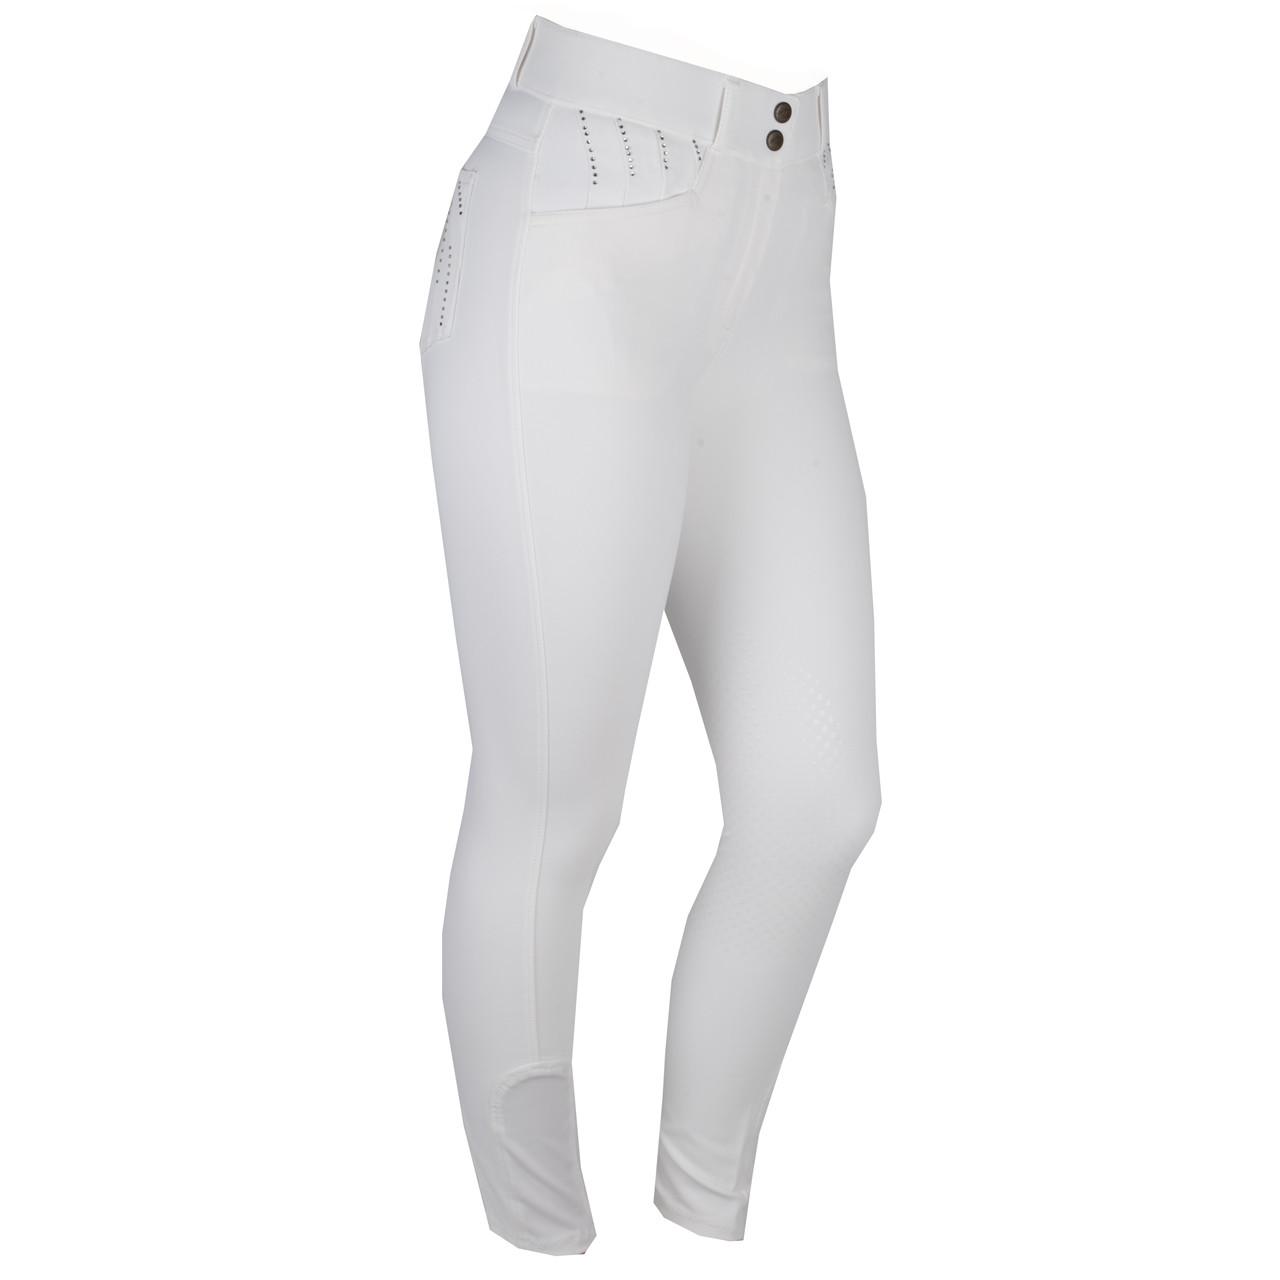 Mondoni Crystal high waist KG rijbroek wit maat:36